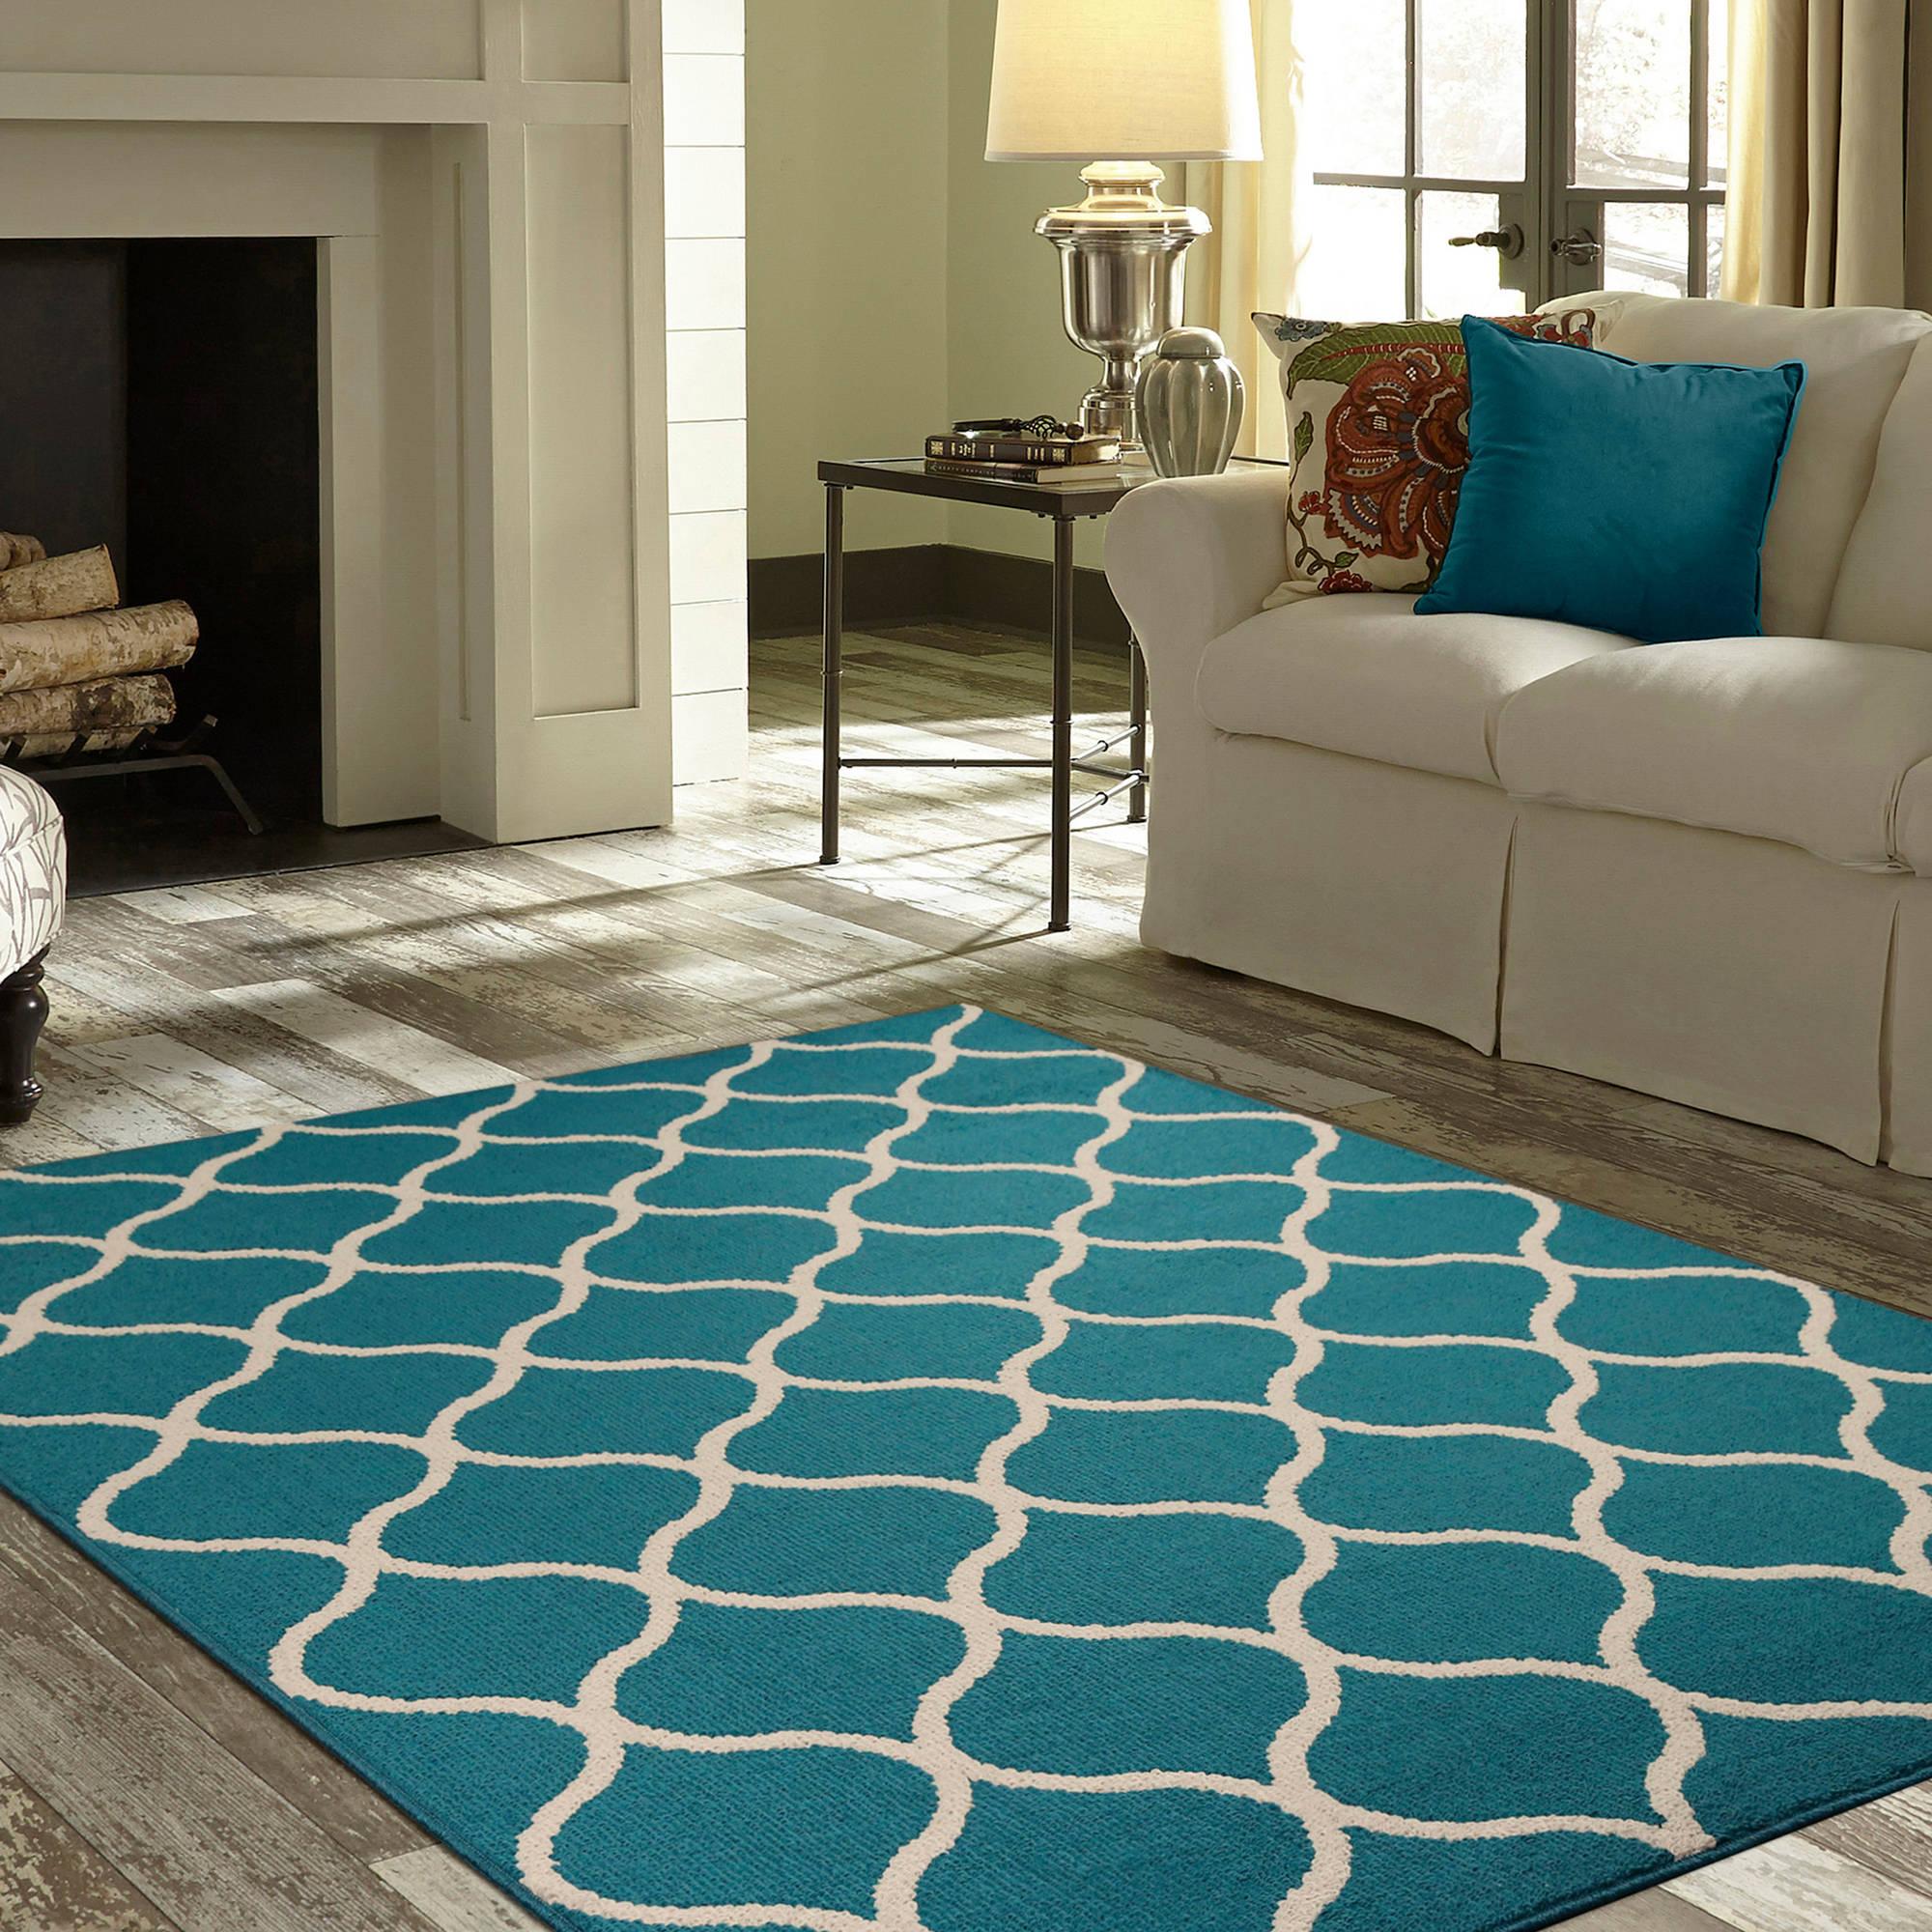 teal rugs mainstays sheridan area rug or runner RJBMFGW